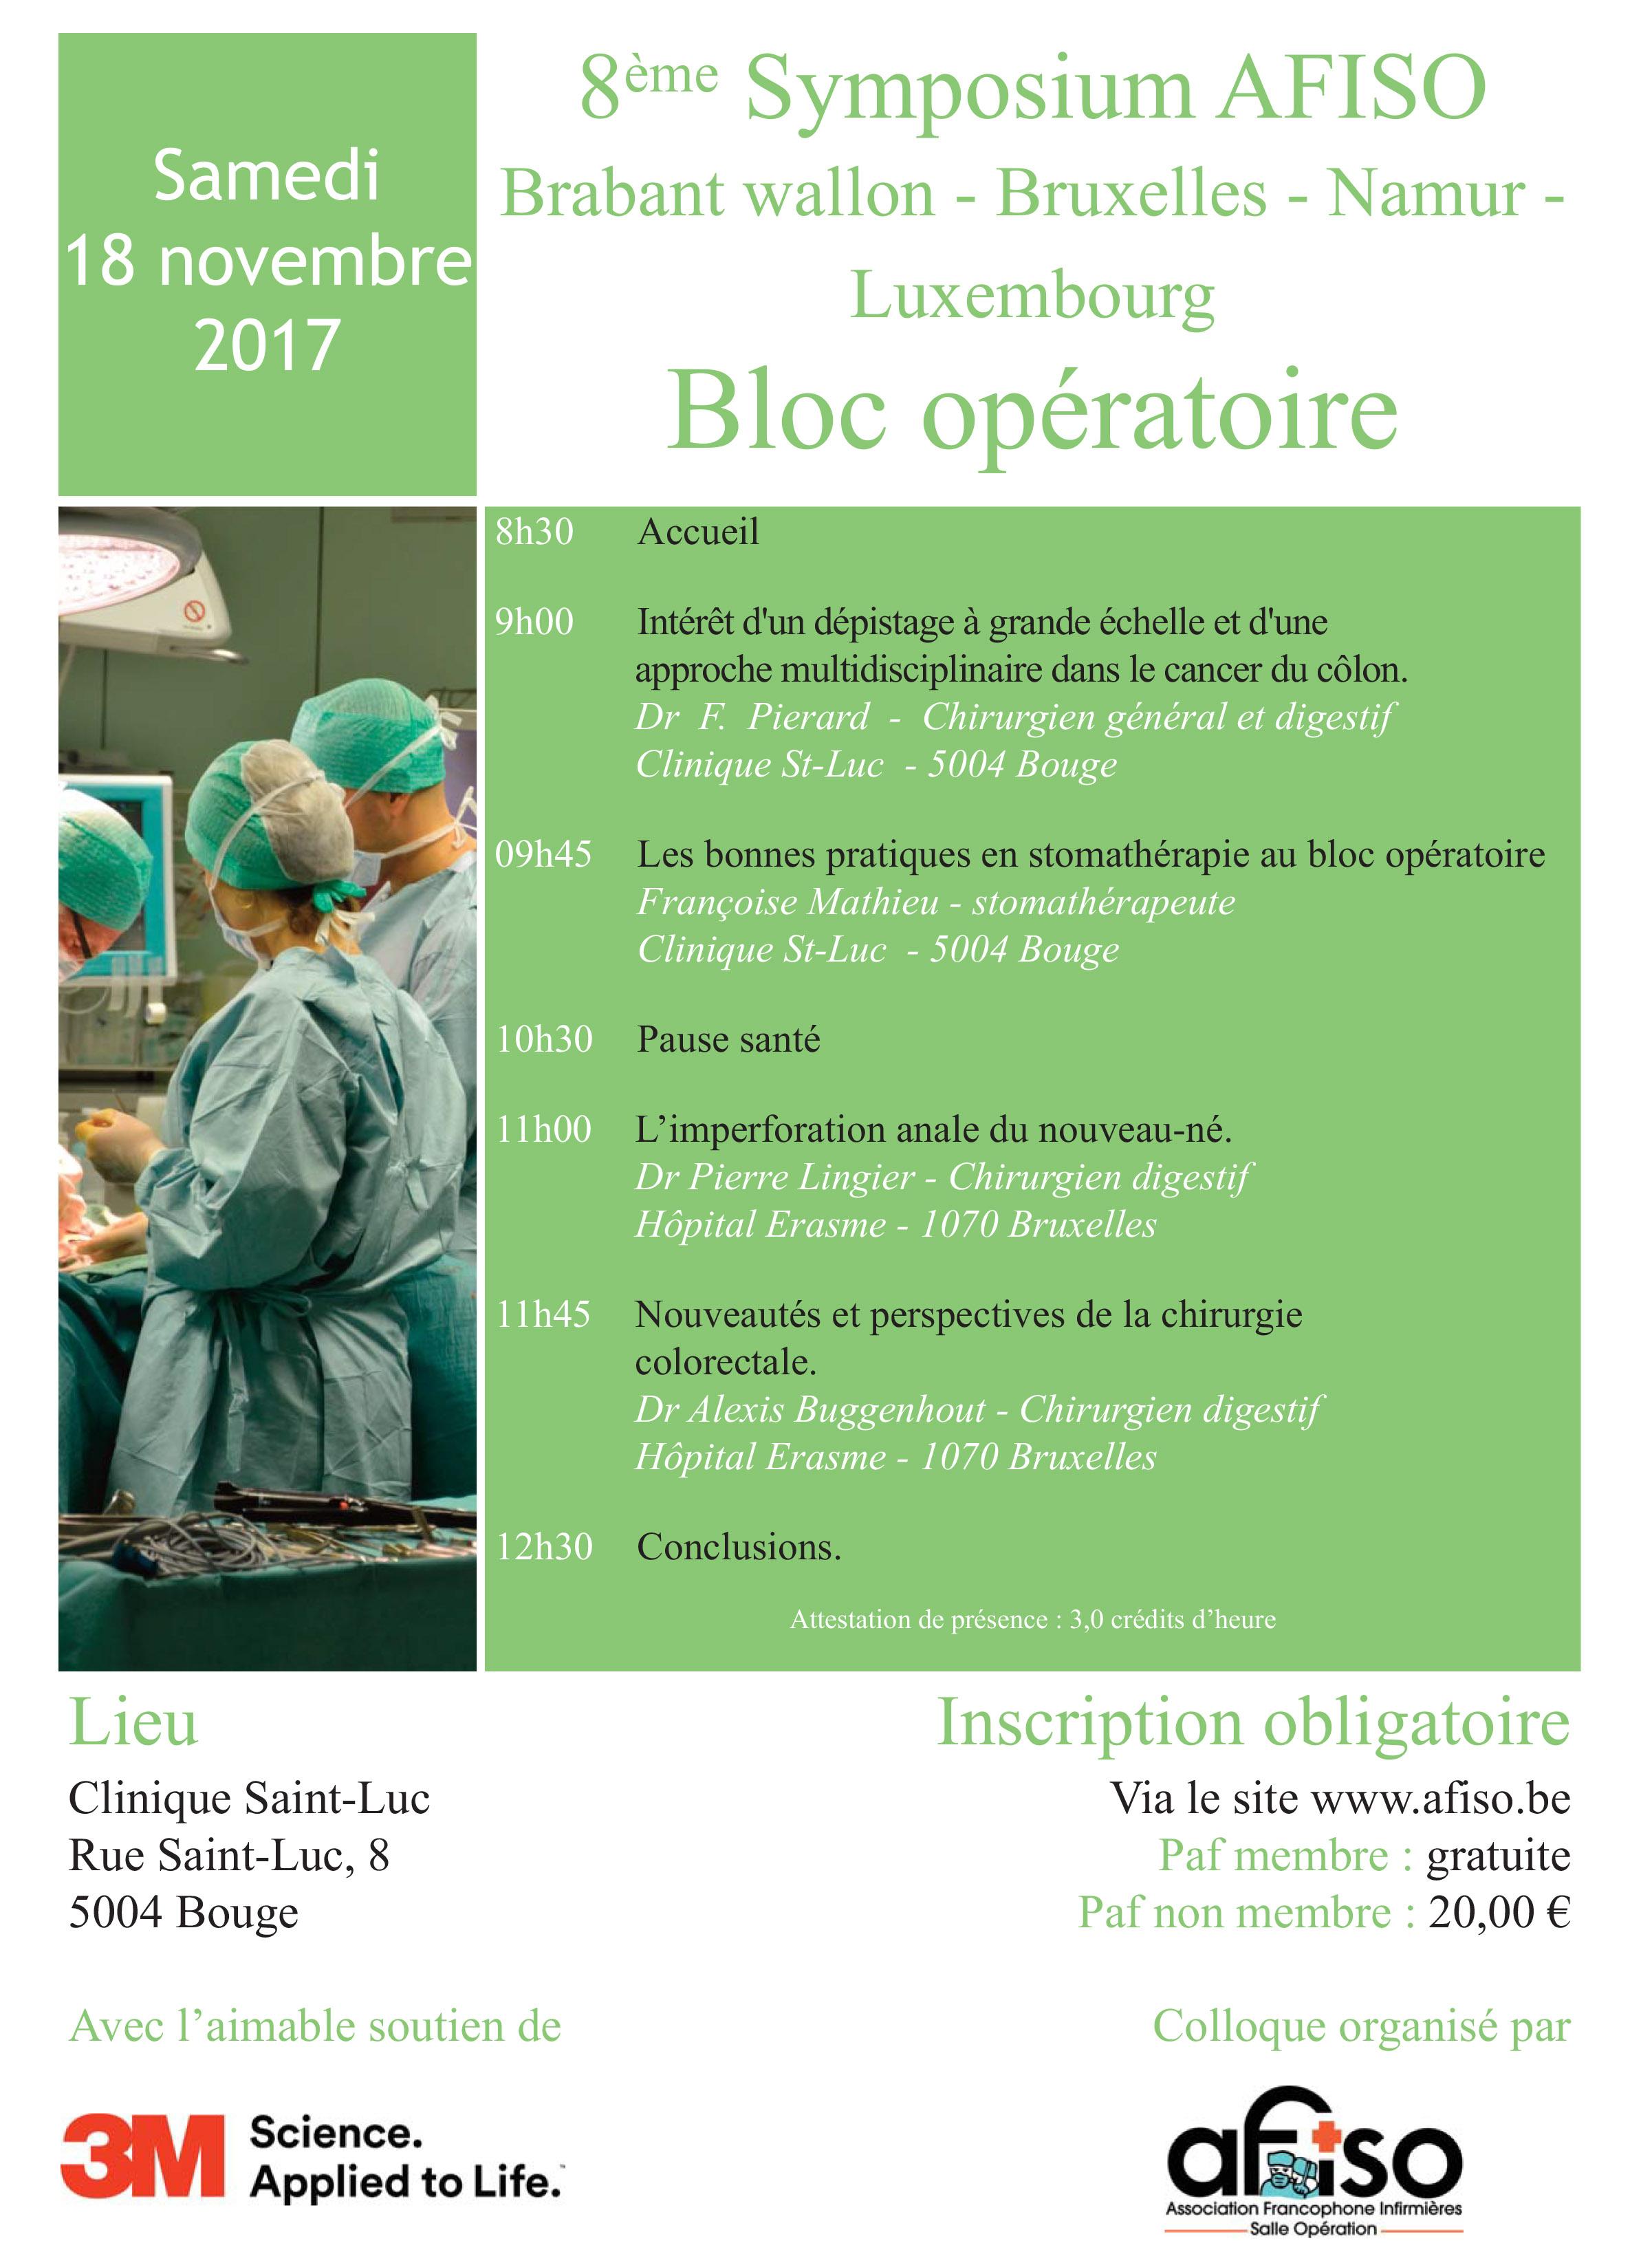 Samedi 18 novembre 2017 - 8ème Symposium AFISO Brabant wallon - Bruxelles - Namur - Luxembourg